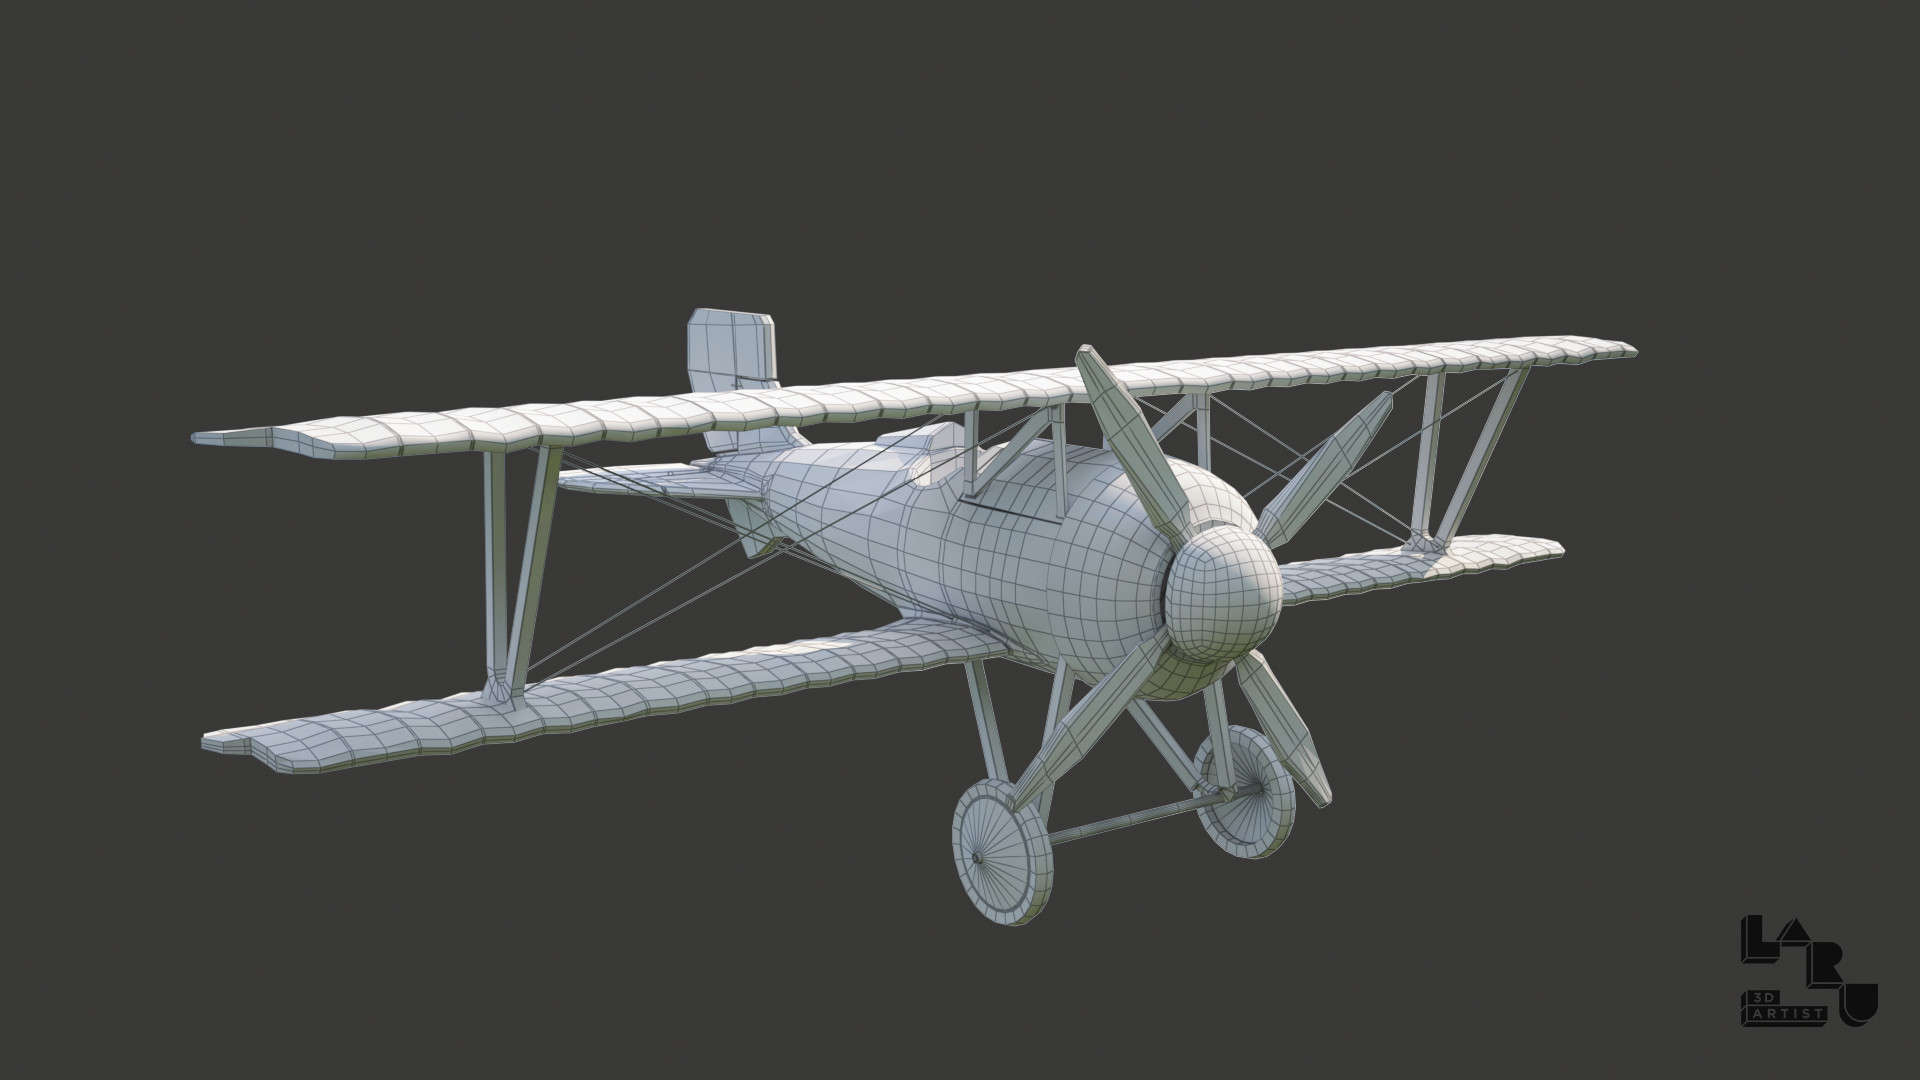 Laru 3d avion3